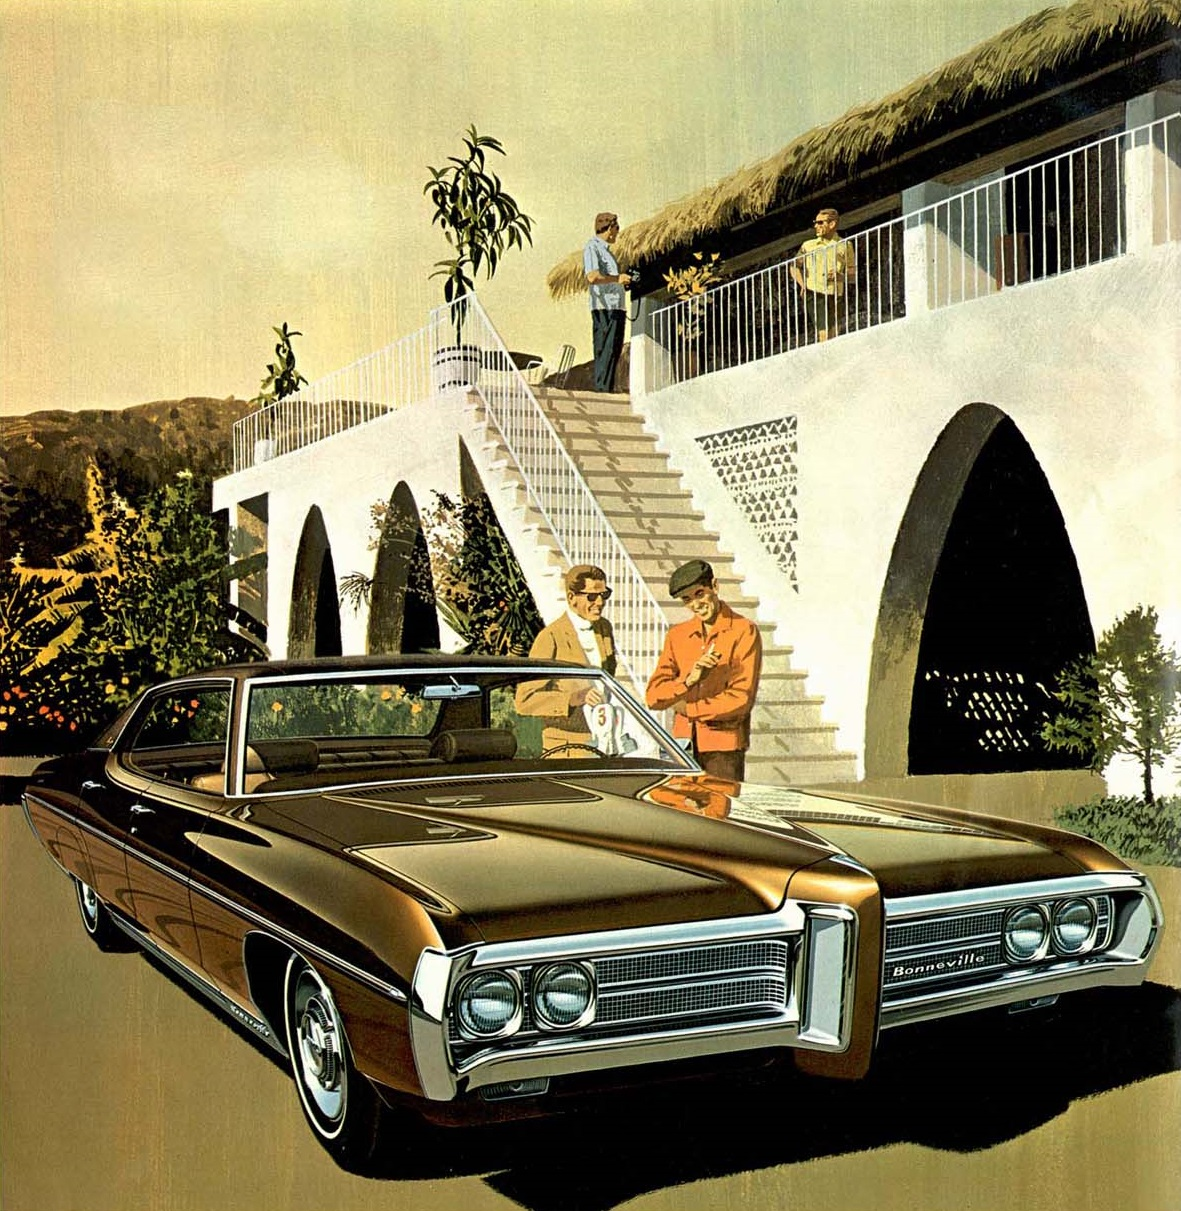 1969 Bonneville Brougham 4-door Coupe